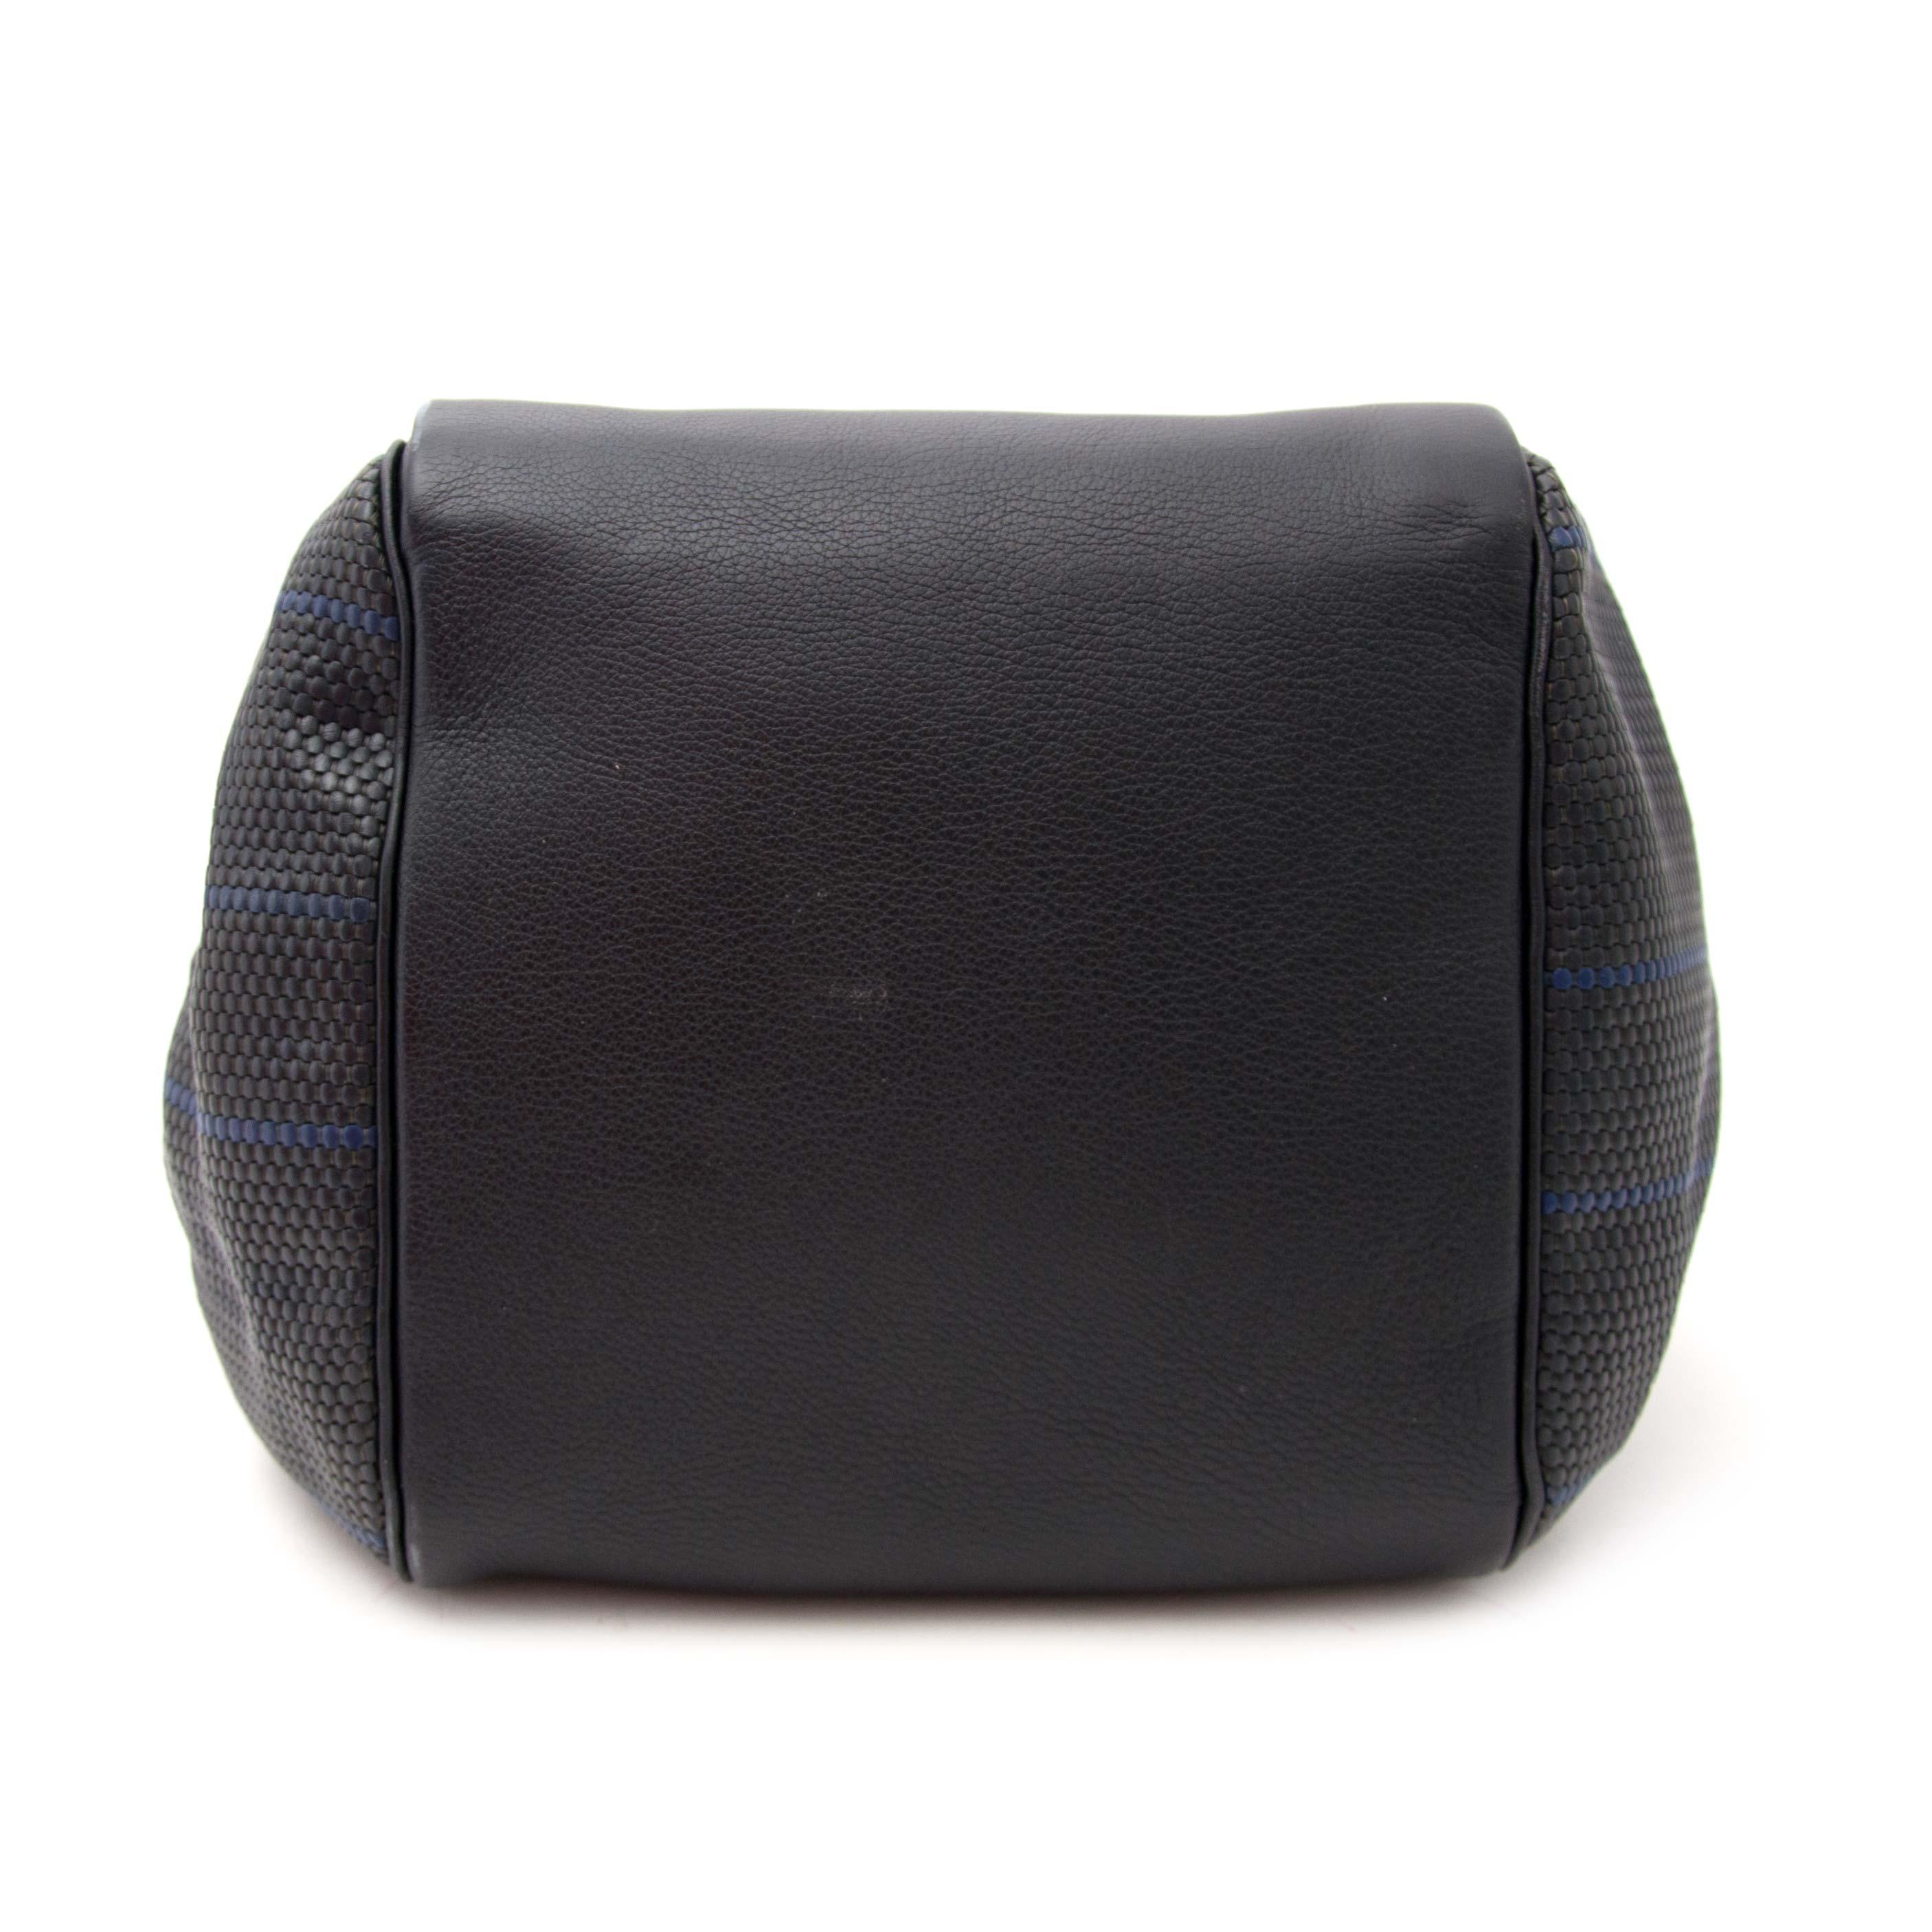 shop safe online your secondhand Delvaux Dark Blue and Black Woven Toile de Cuir  Top Handle Bag